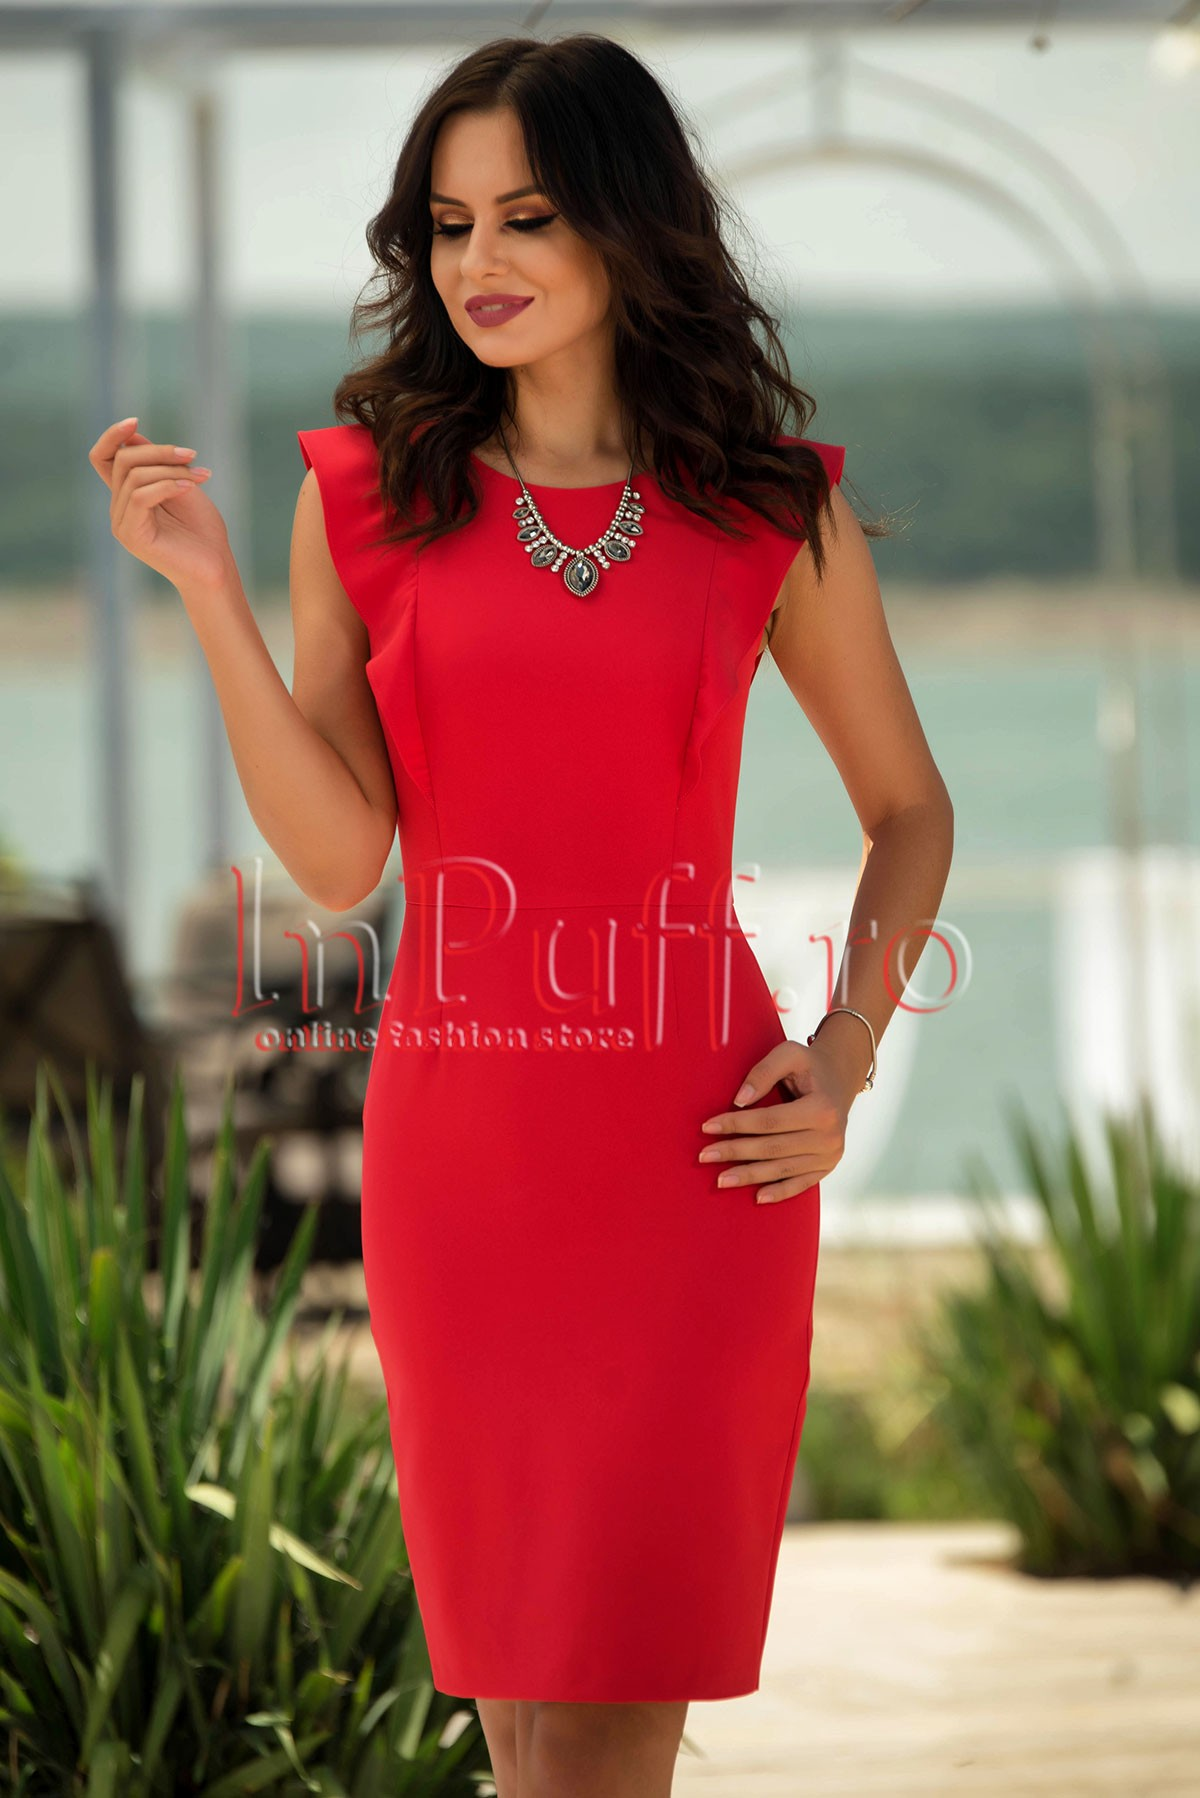 rochie-conica-eleganta-stofa-corai-1502785923-4